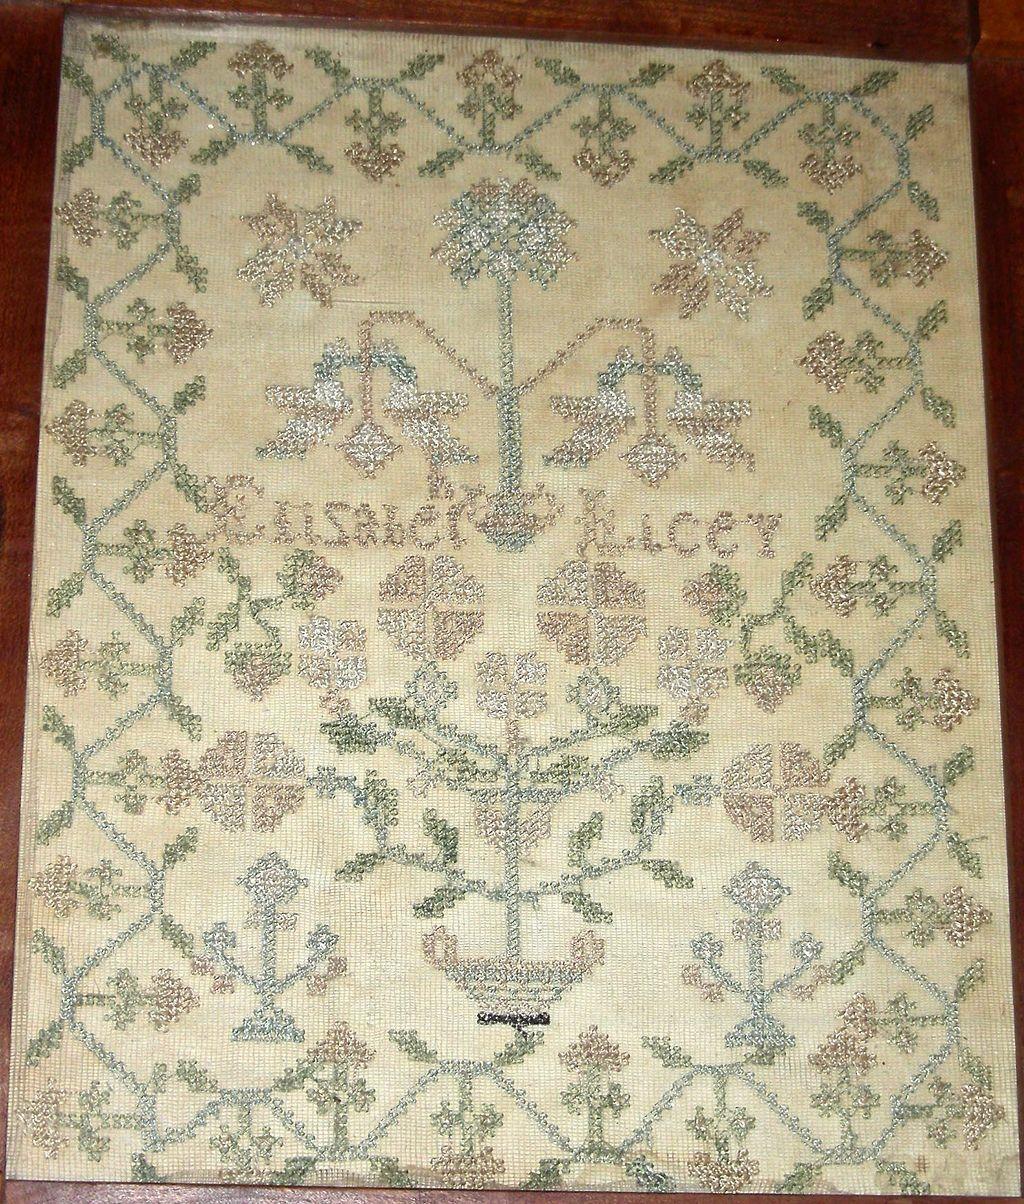 Silk on Silk Needlework Sampler by Elizabeth Lacey, Possibly Pennsylvania, c. 1820